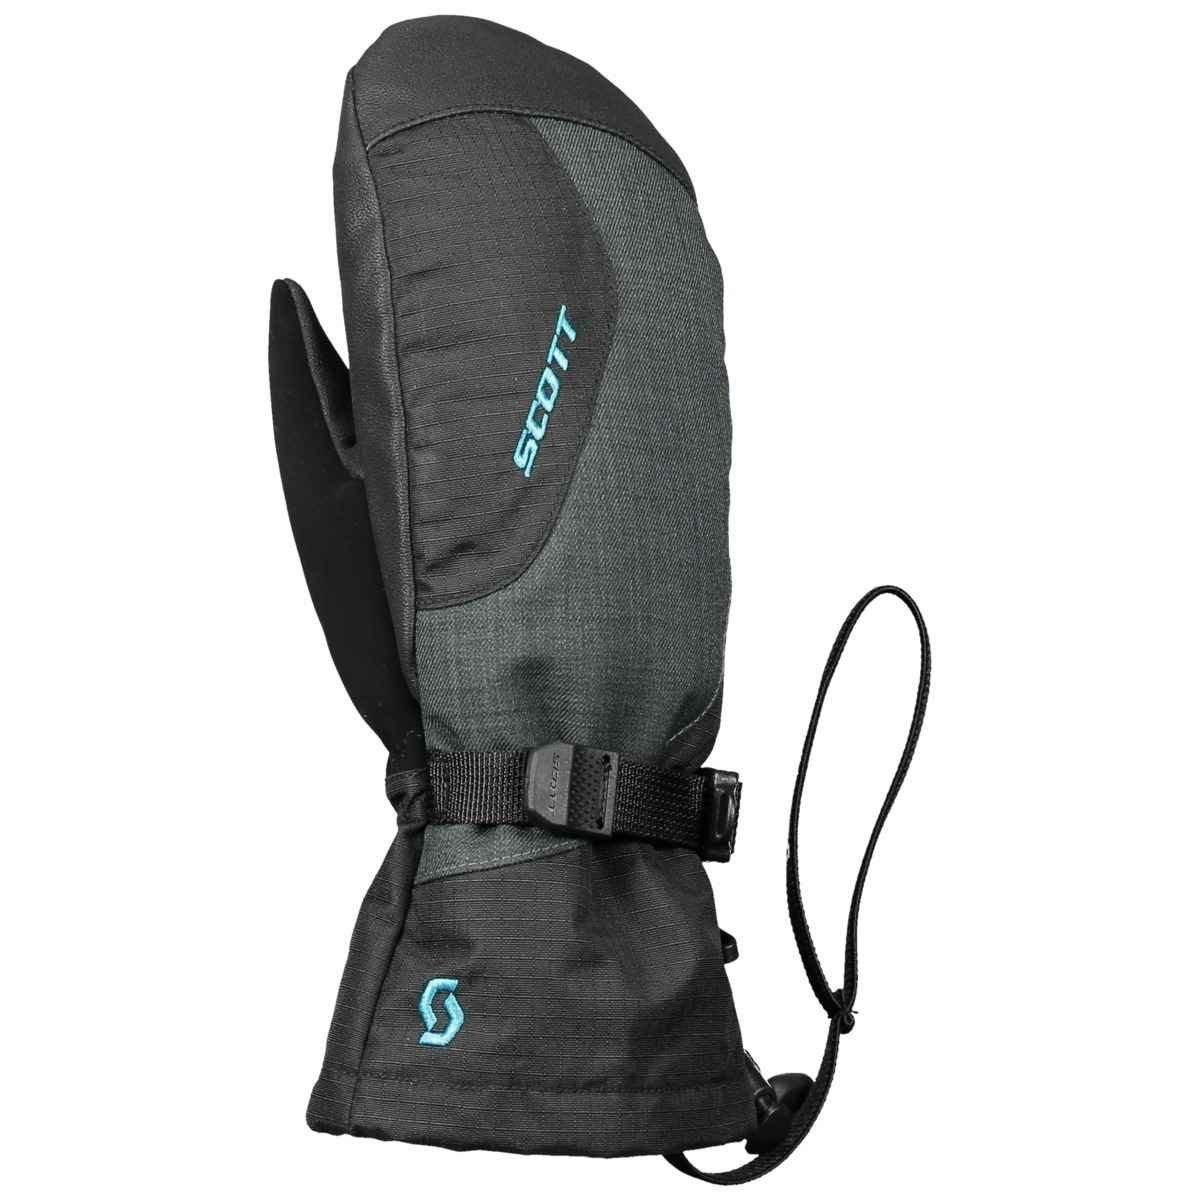 Scott Sports SCO Mitten JR Ultimate Premium GTX - 254569 (Black/Marina Blue - L)